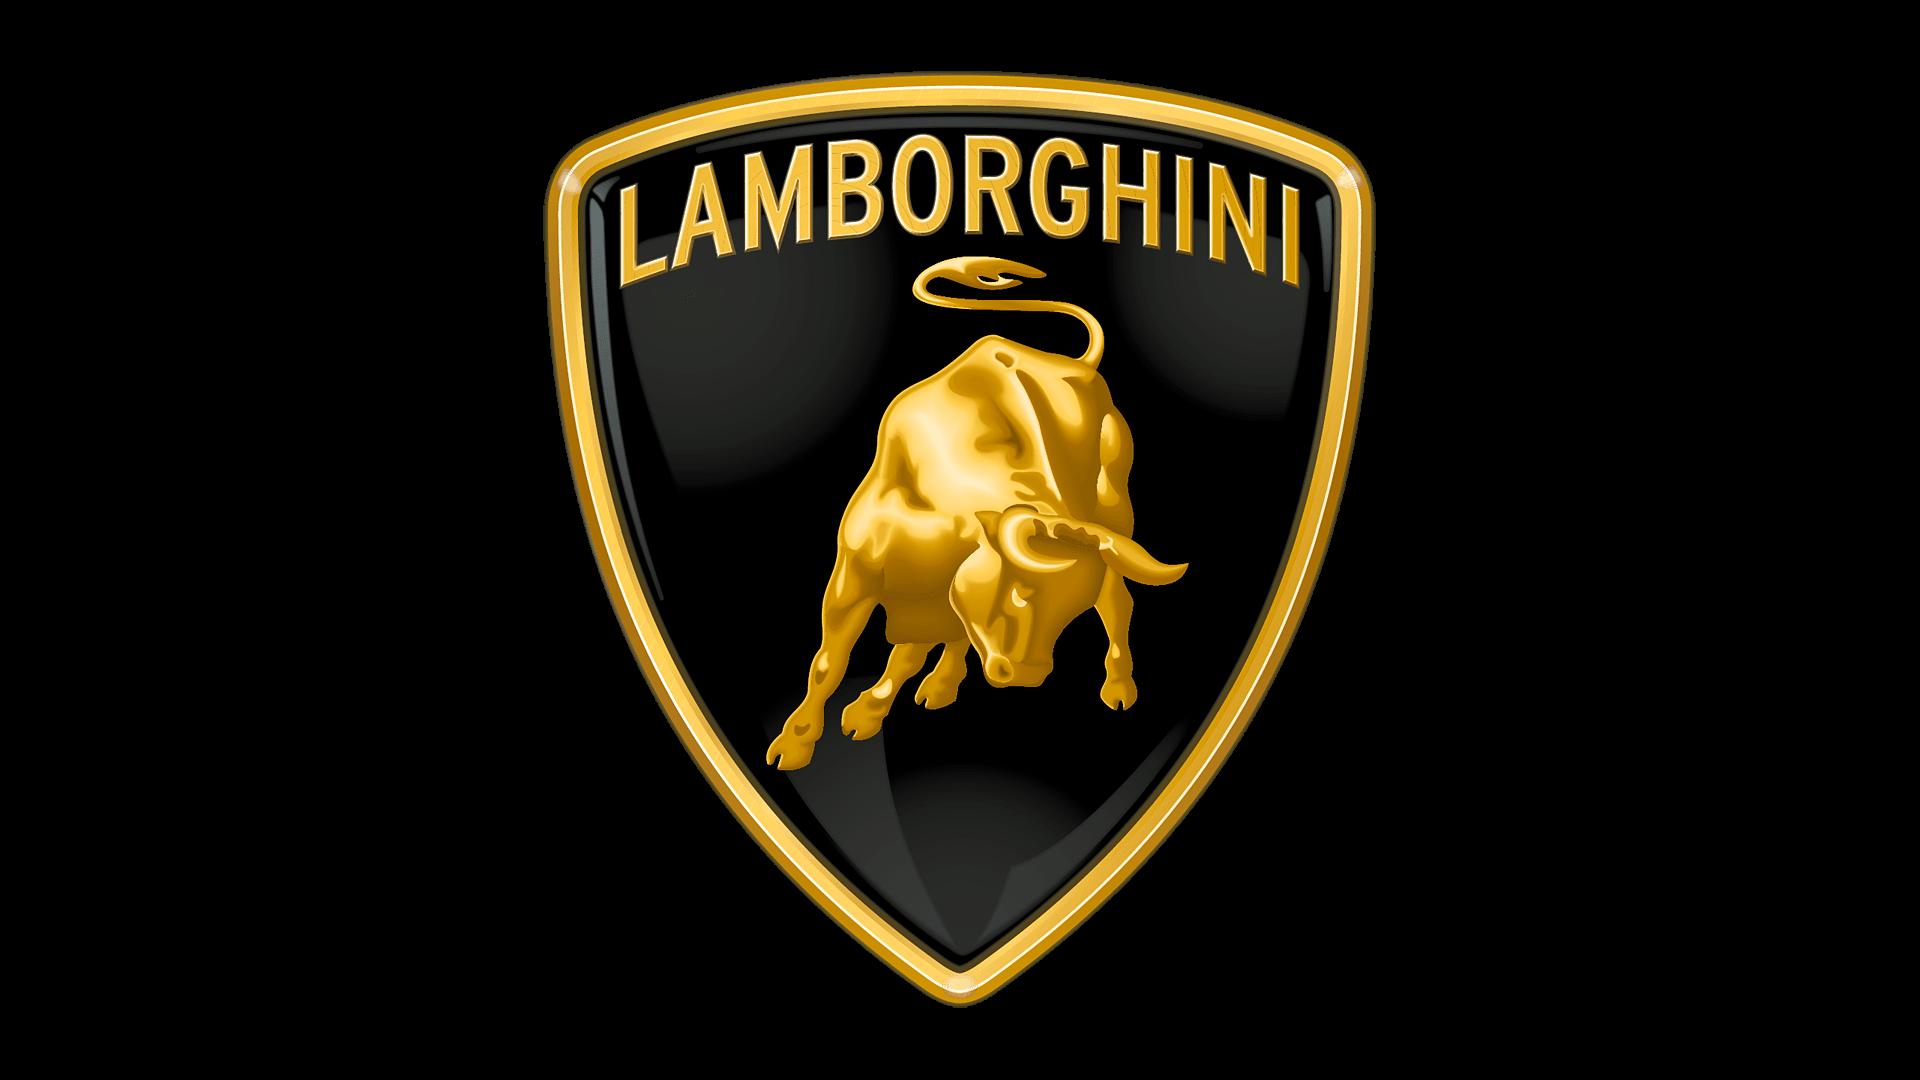 Lamborghini clipart silhouette Logo Lamborghini Lamborghini Car Car